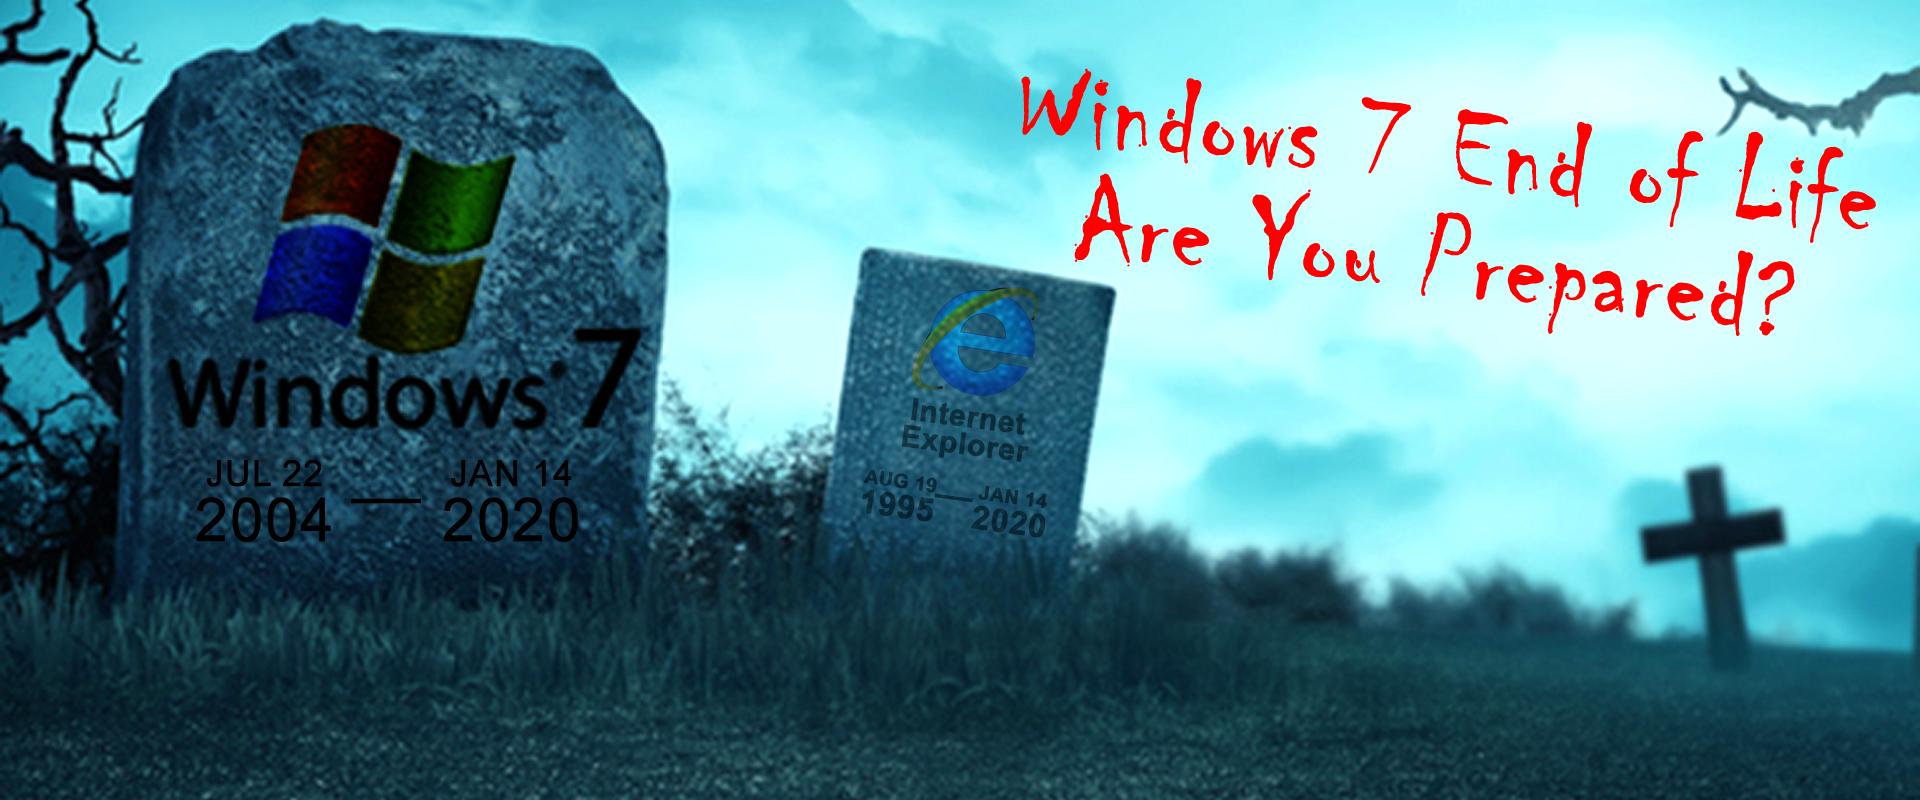 Windows 7 End of Life – WhiteStone Computers LLC